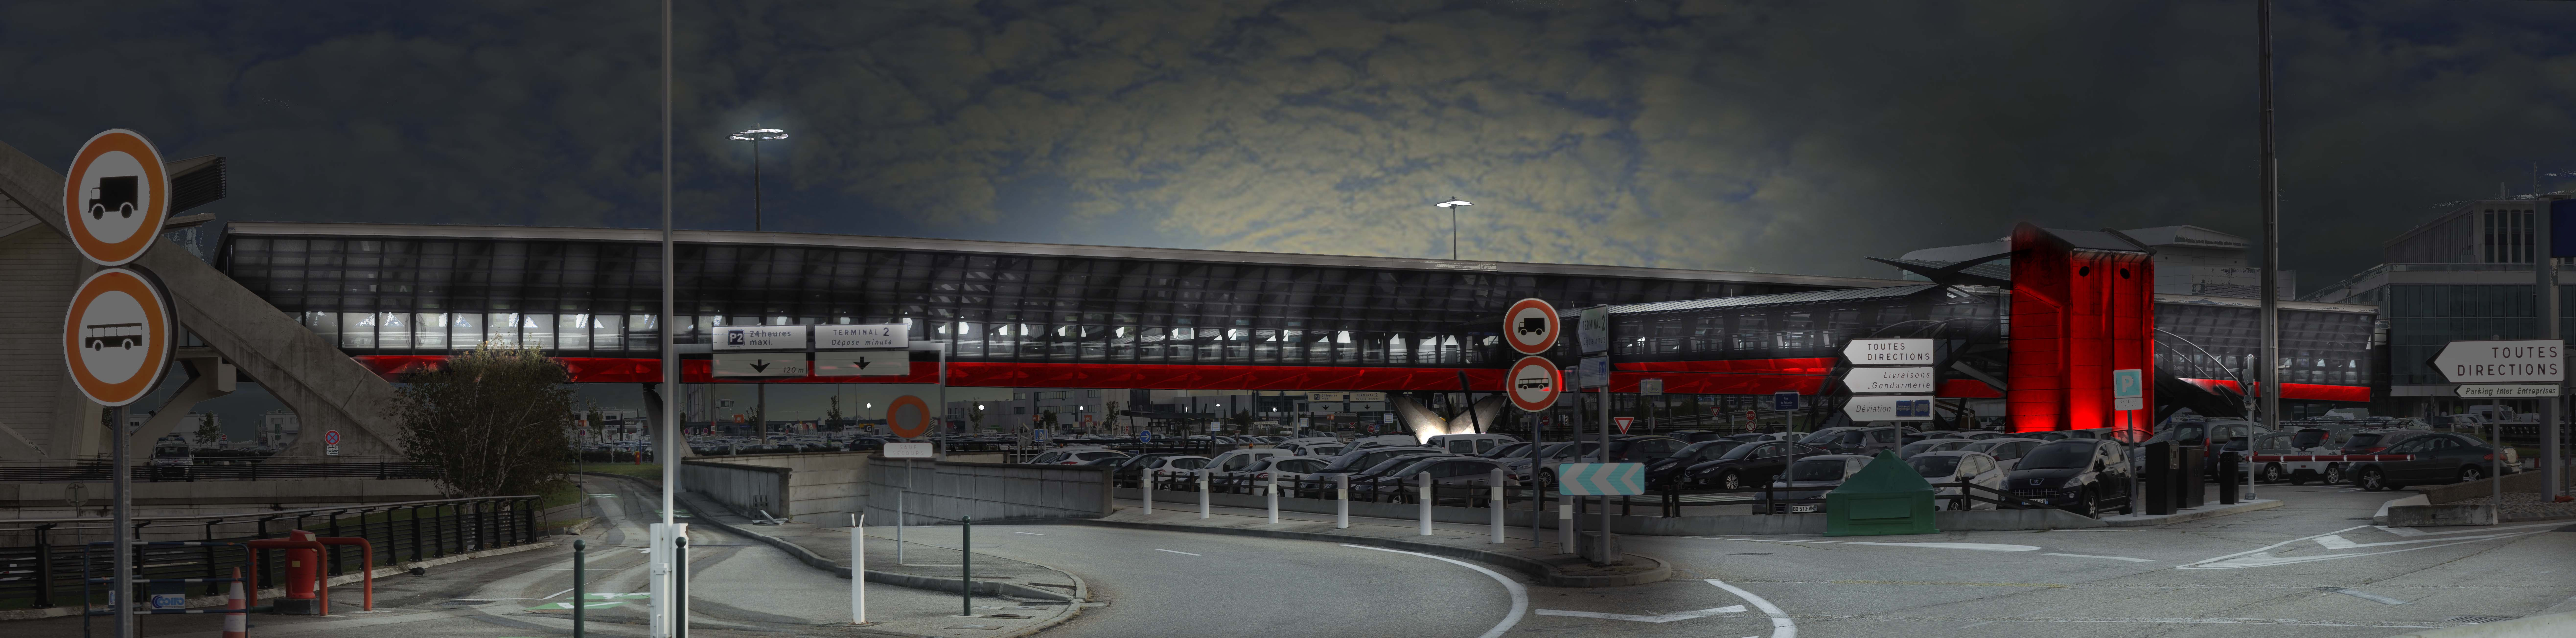 MEV _ Passerelle gare SNCF-Aéroport